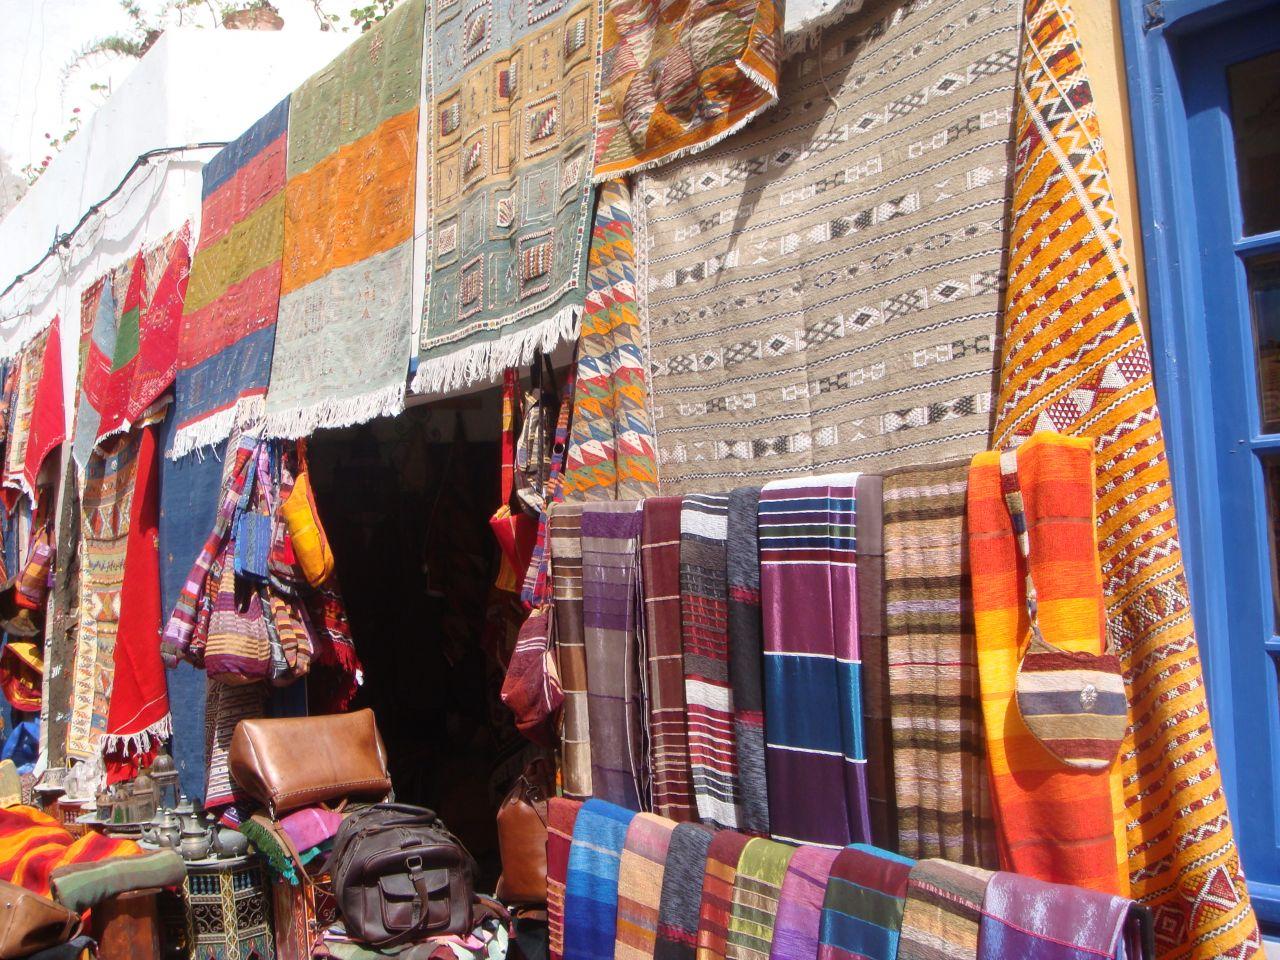 Maroc, episodul 4: Essaouira, shaorma si vant puternic